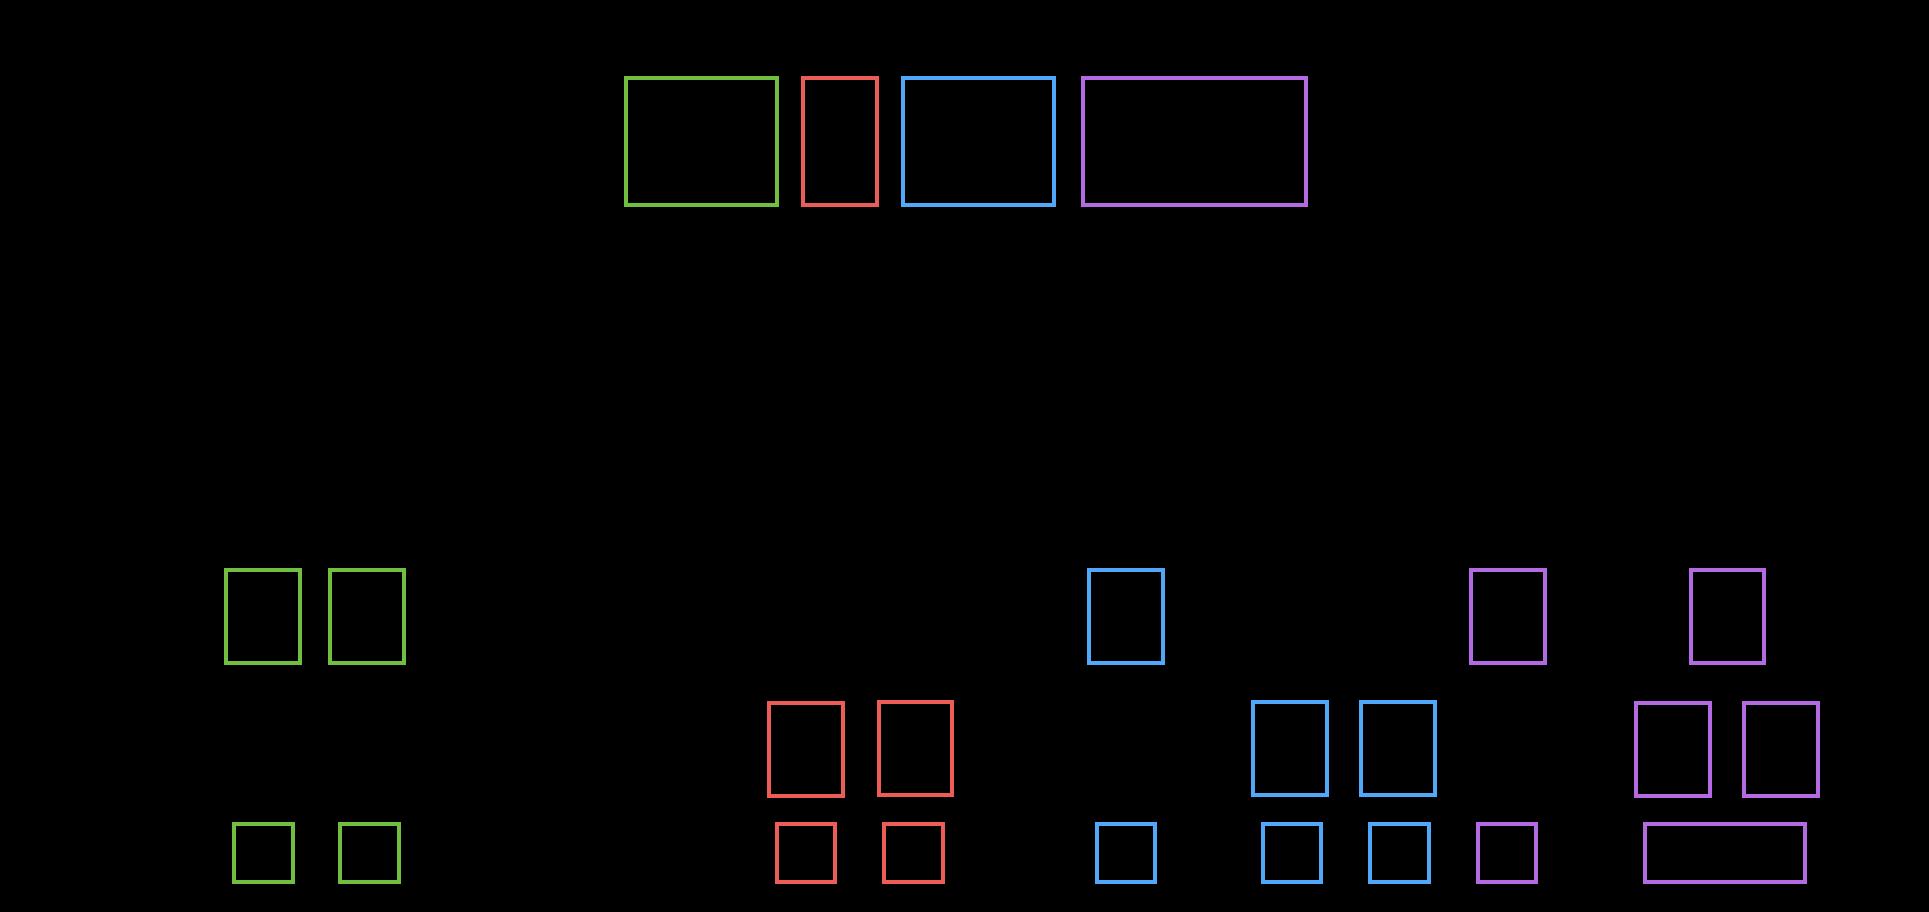 ipv4-octets-summed.png